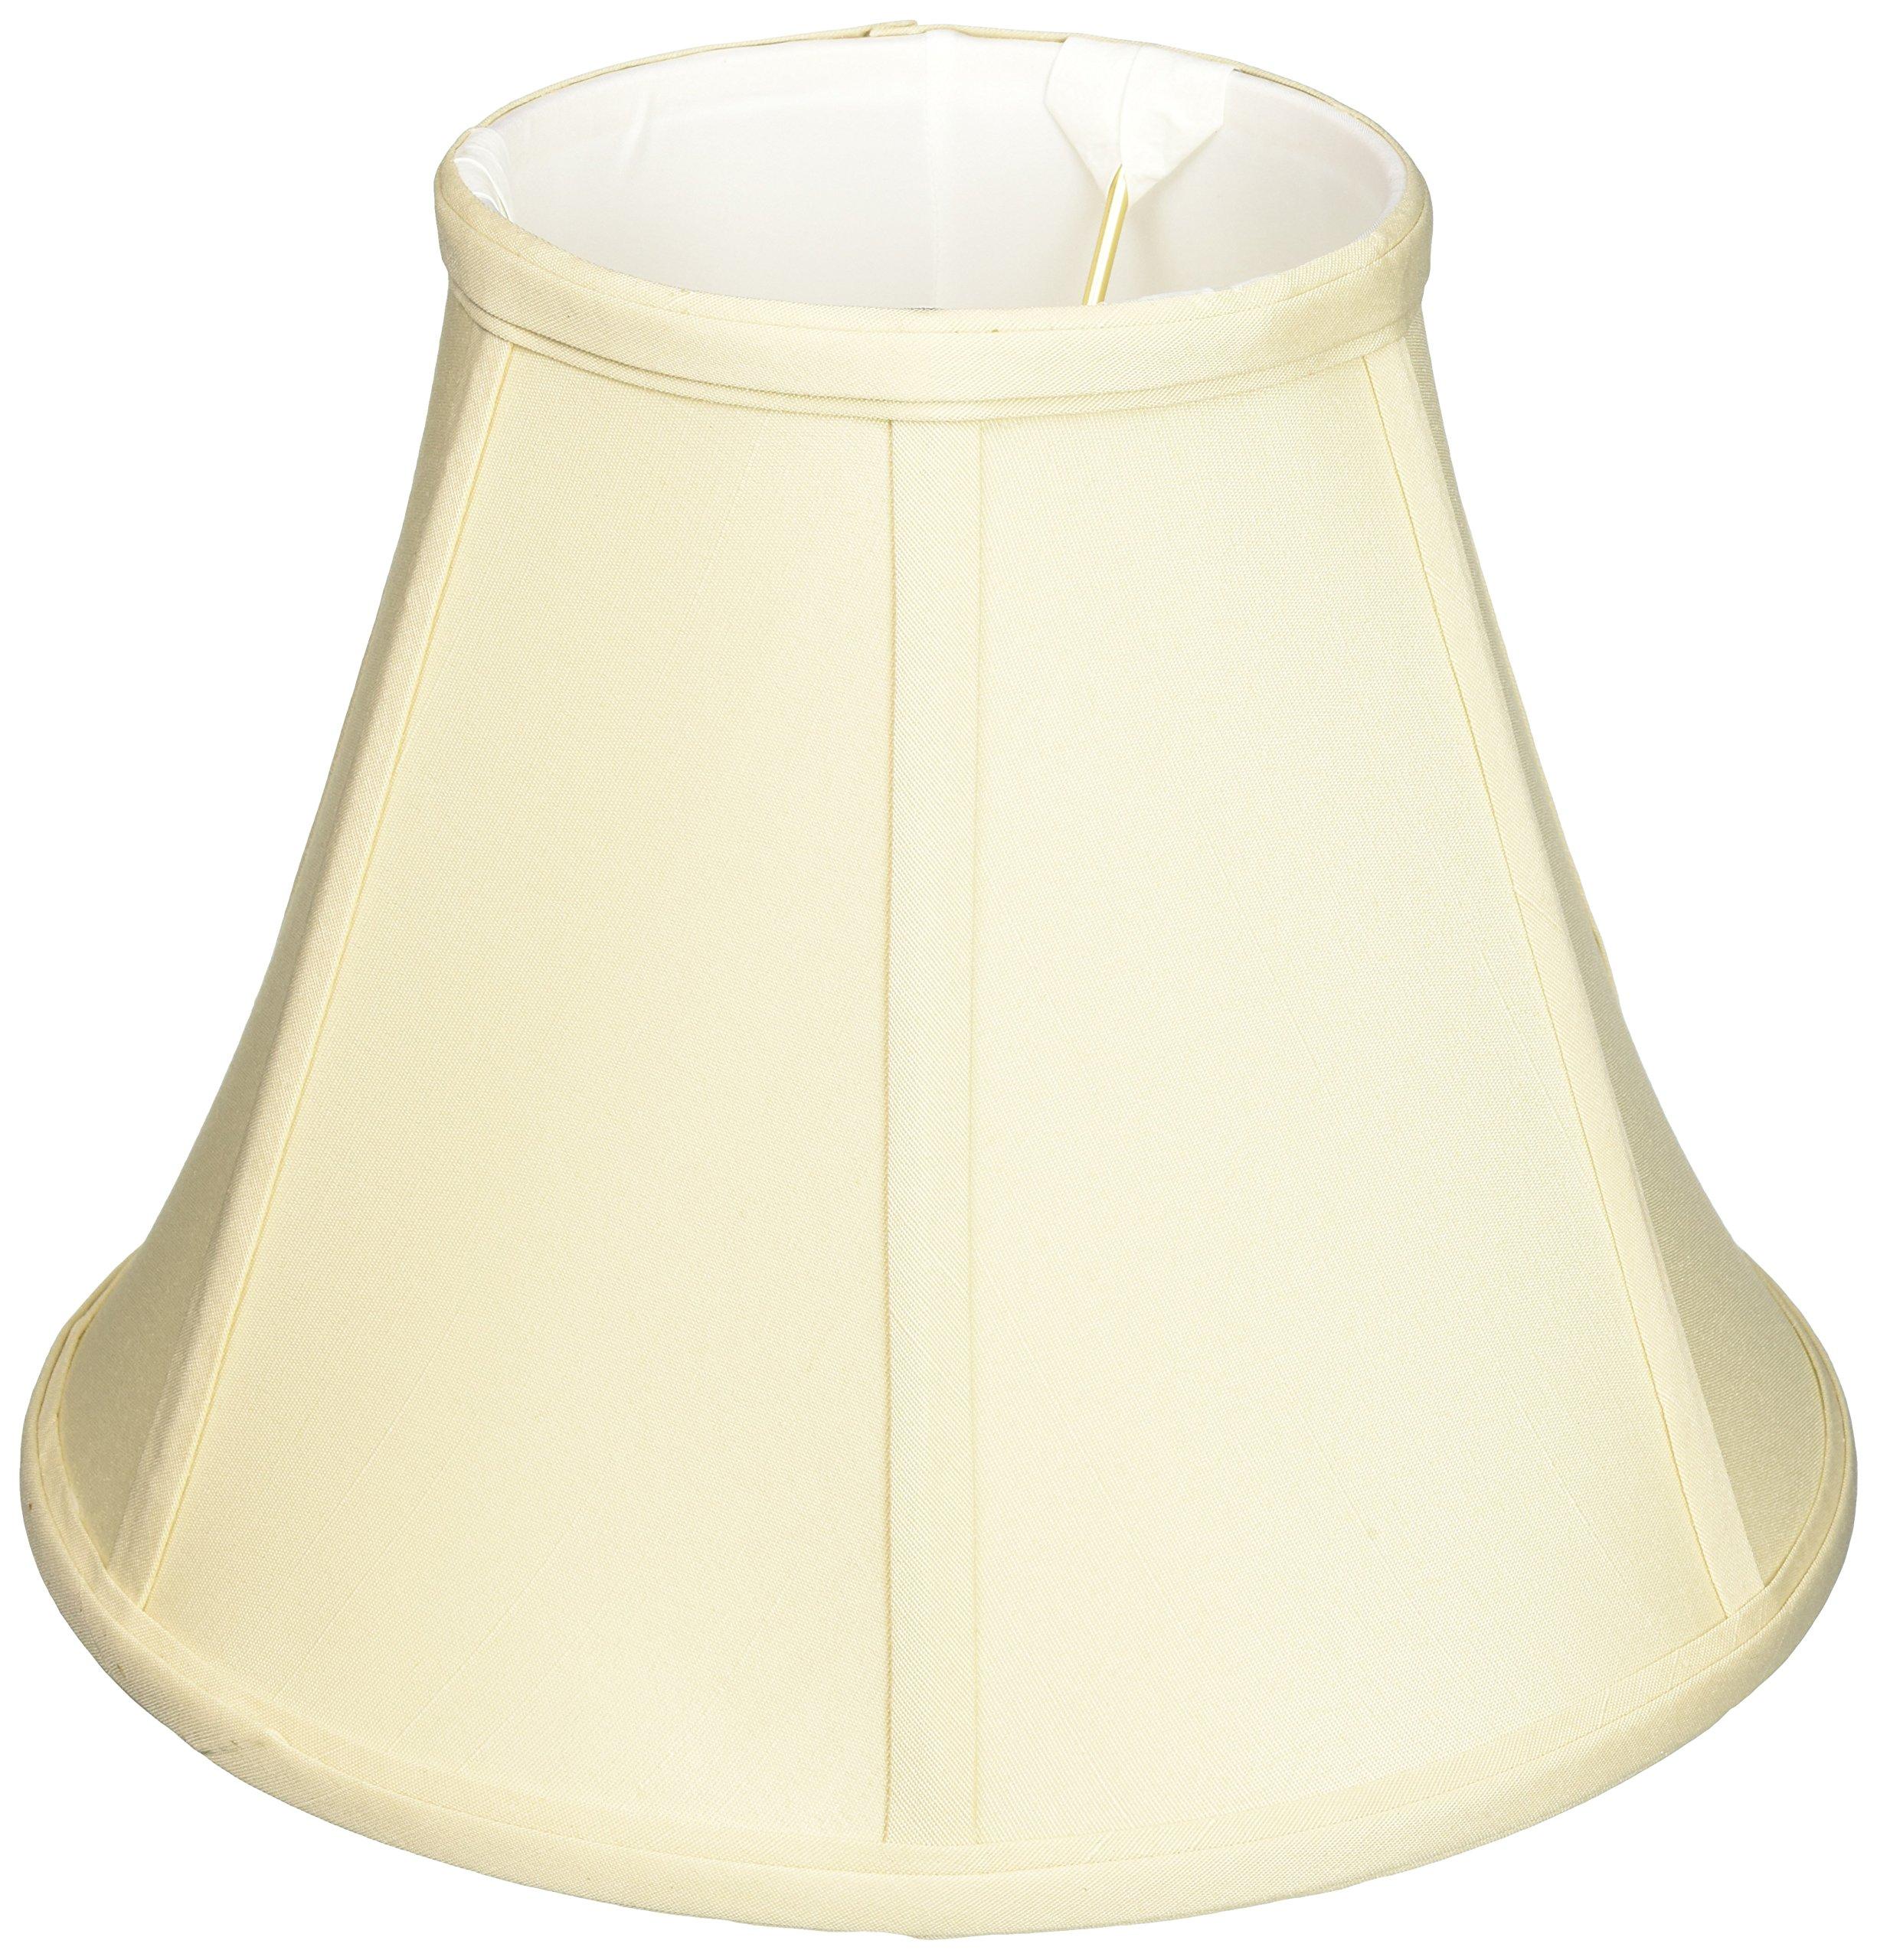 Royal Designs Deep Empire Lamp Shade, Beige, 5 x 10 x 8, UNO Floor Lamp